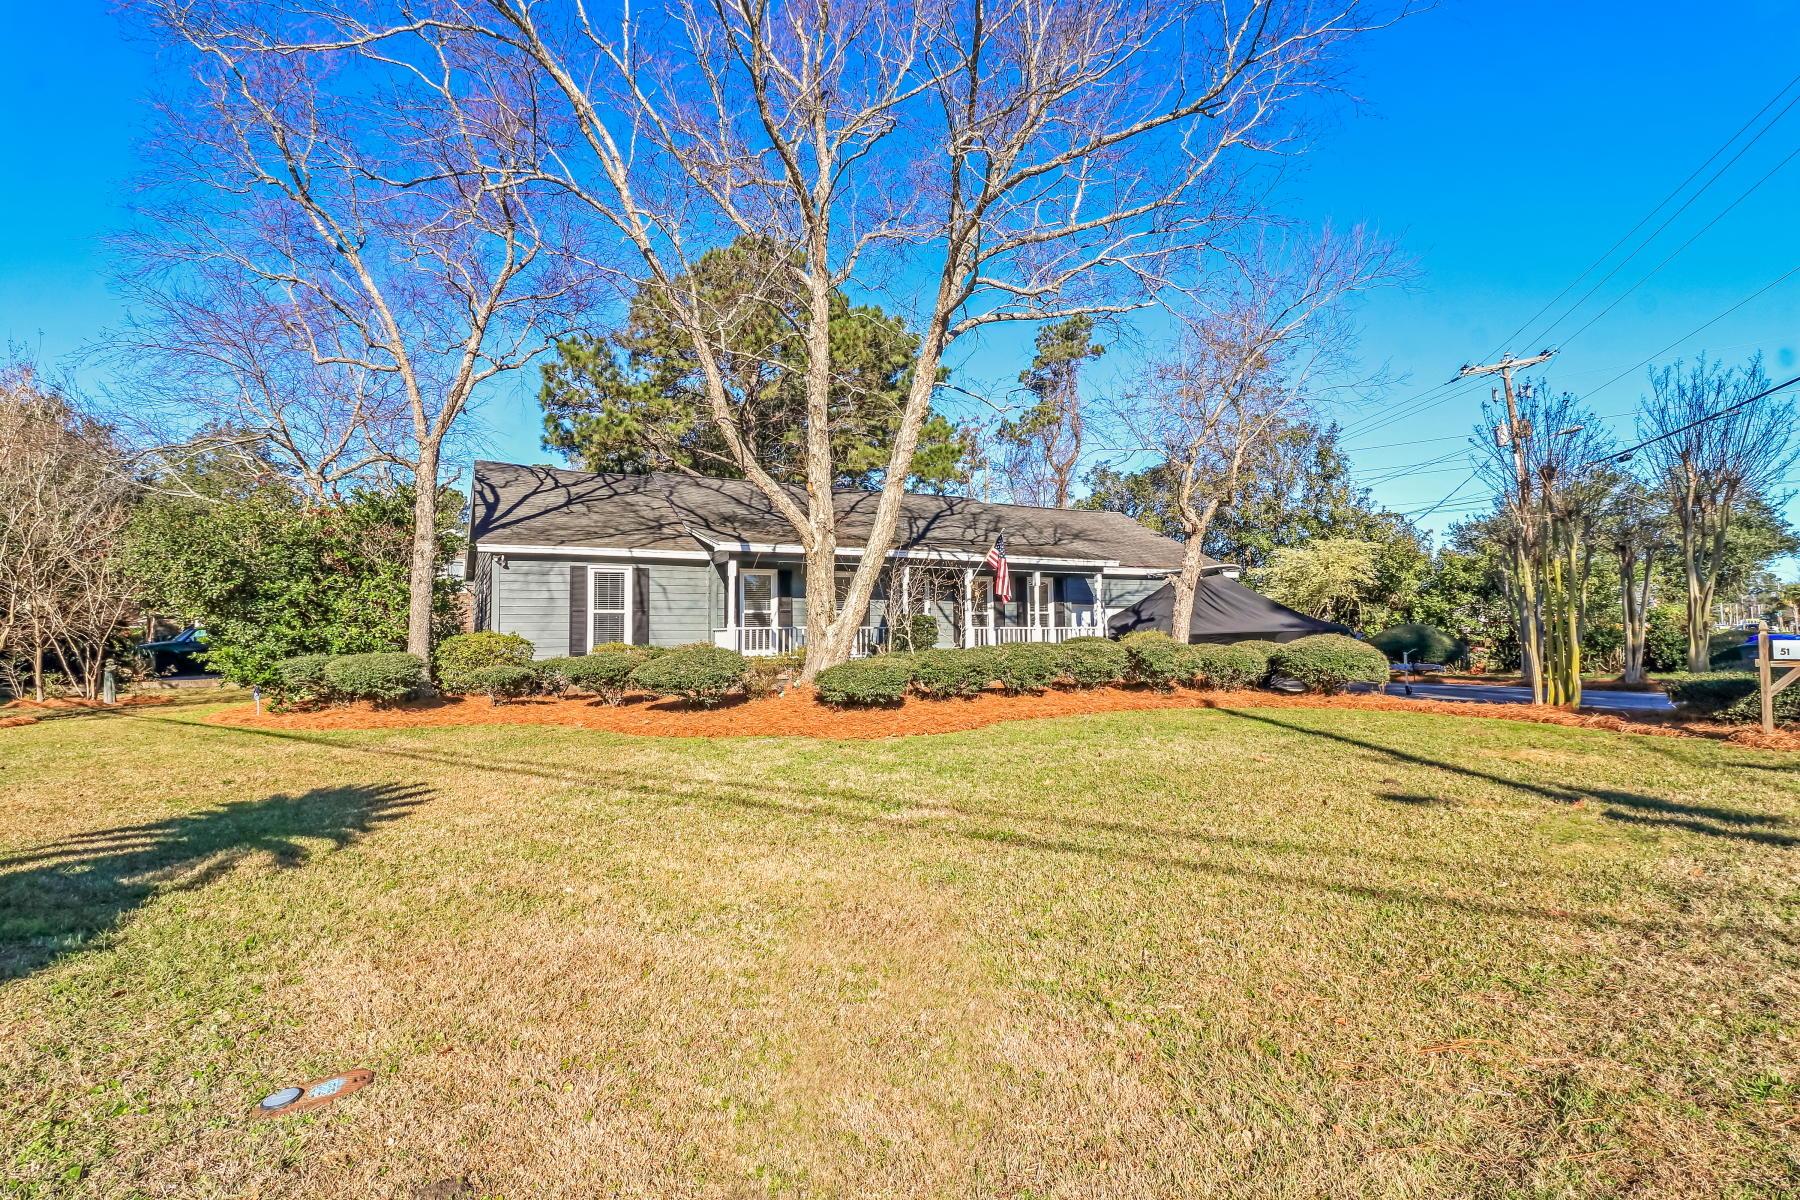 Harrison Acres Homes For Sale - 51 Markfield, Charleston, SC - 2